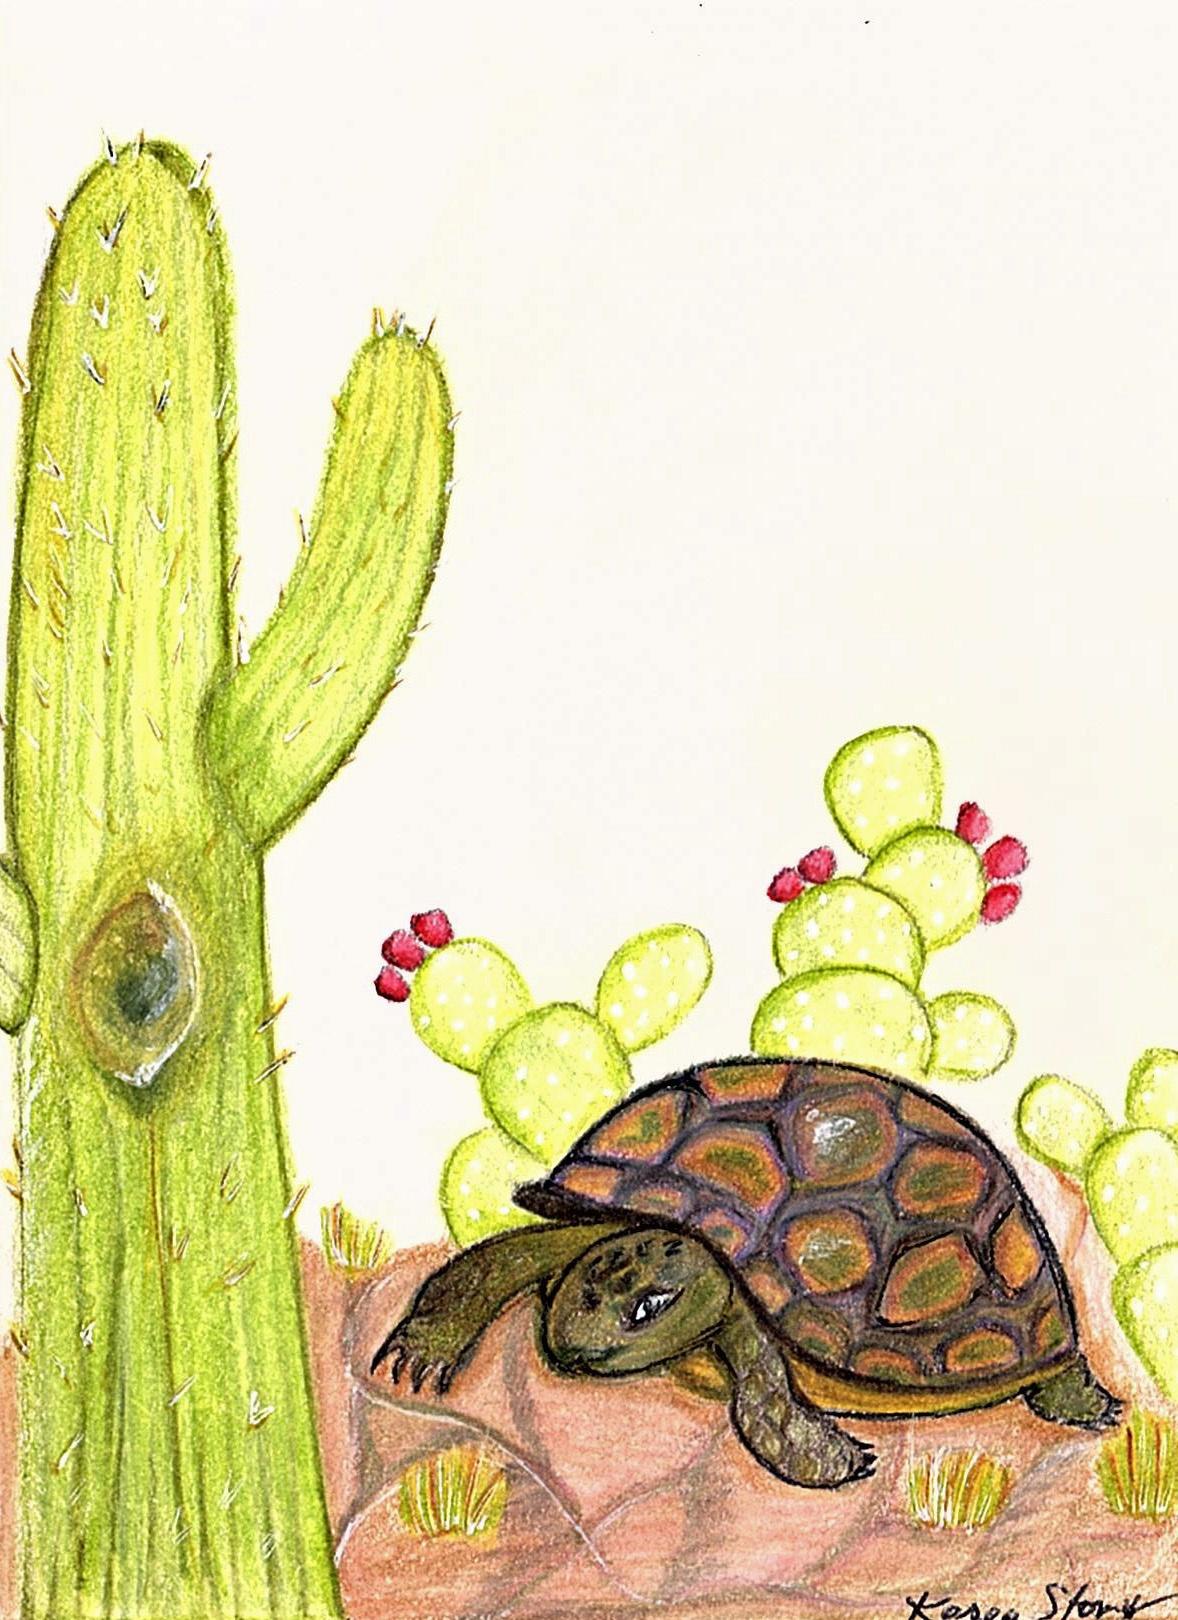 Tortoise and Cactus